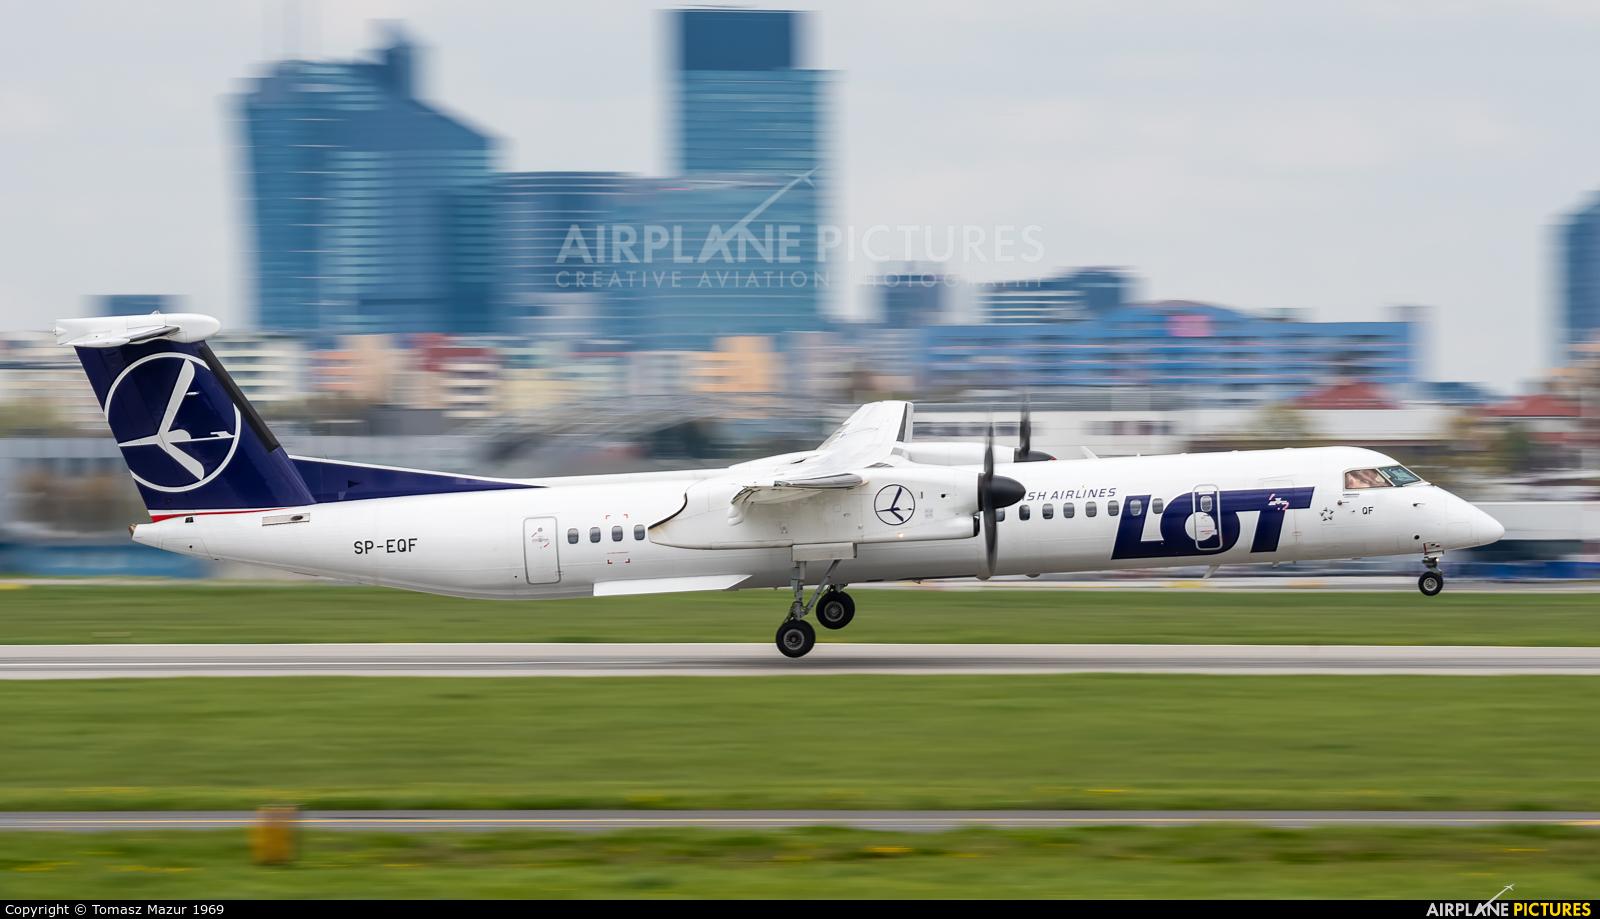 LOT - Polish Airlines SP-EQF aircraft at Warsaw - Frederic Chopin